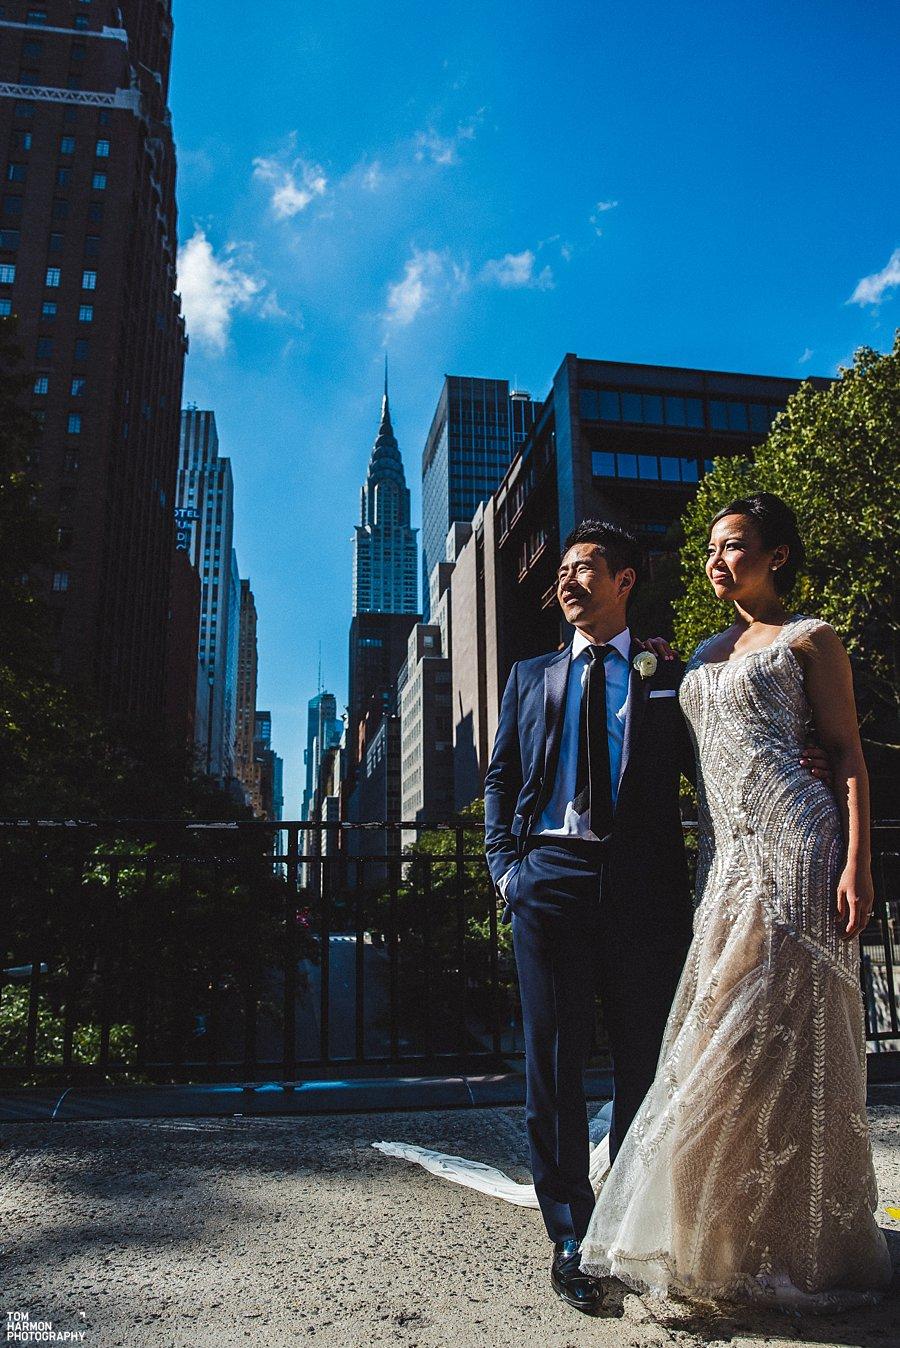 chrysler building wedding